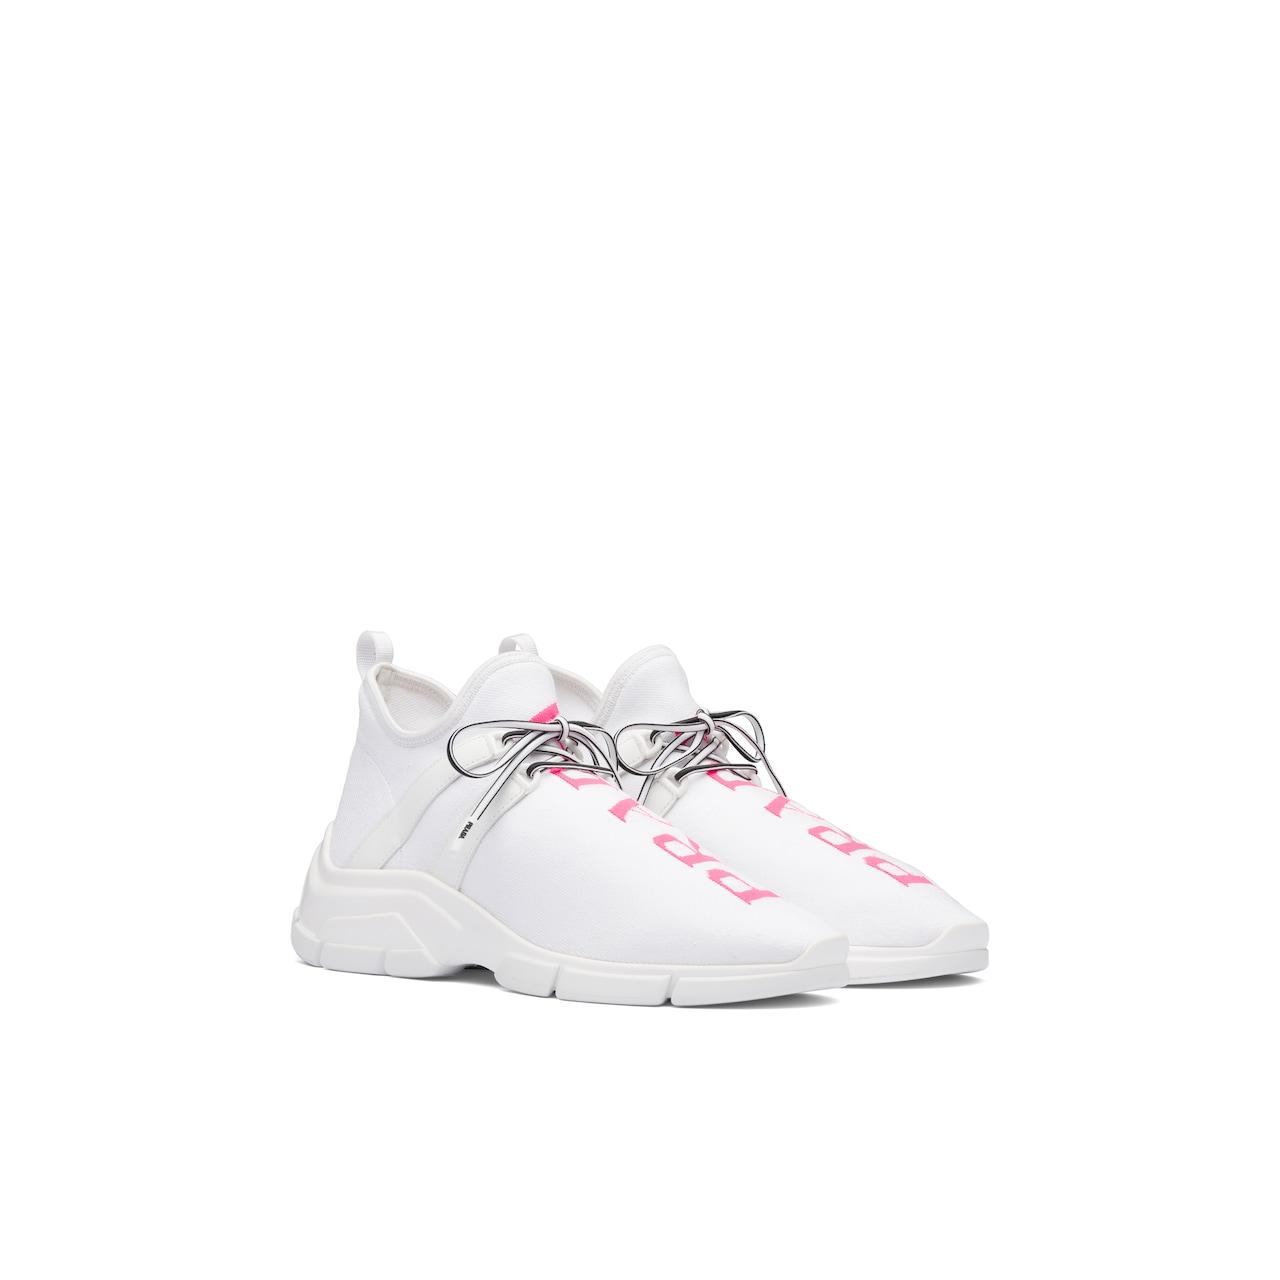 Prada 针织运动鞋 1